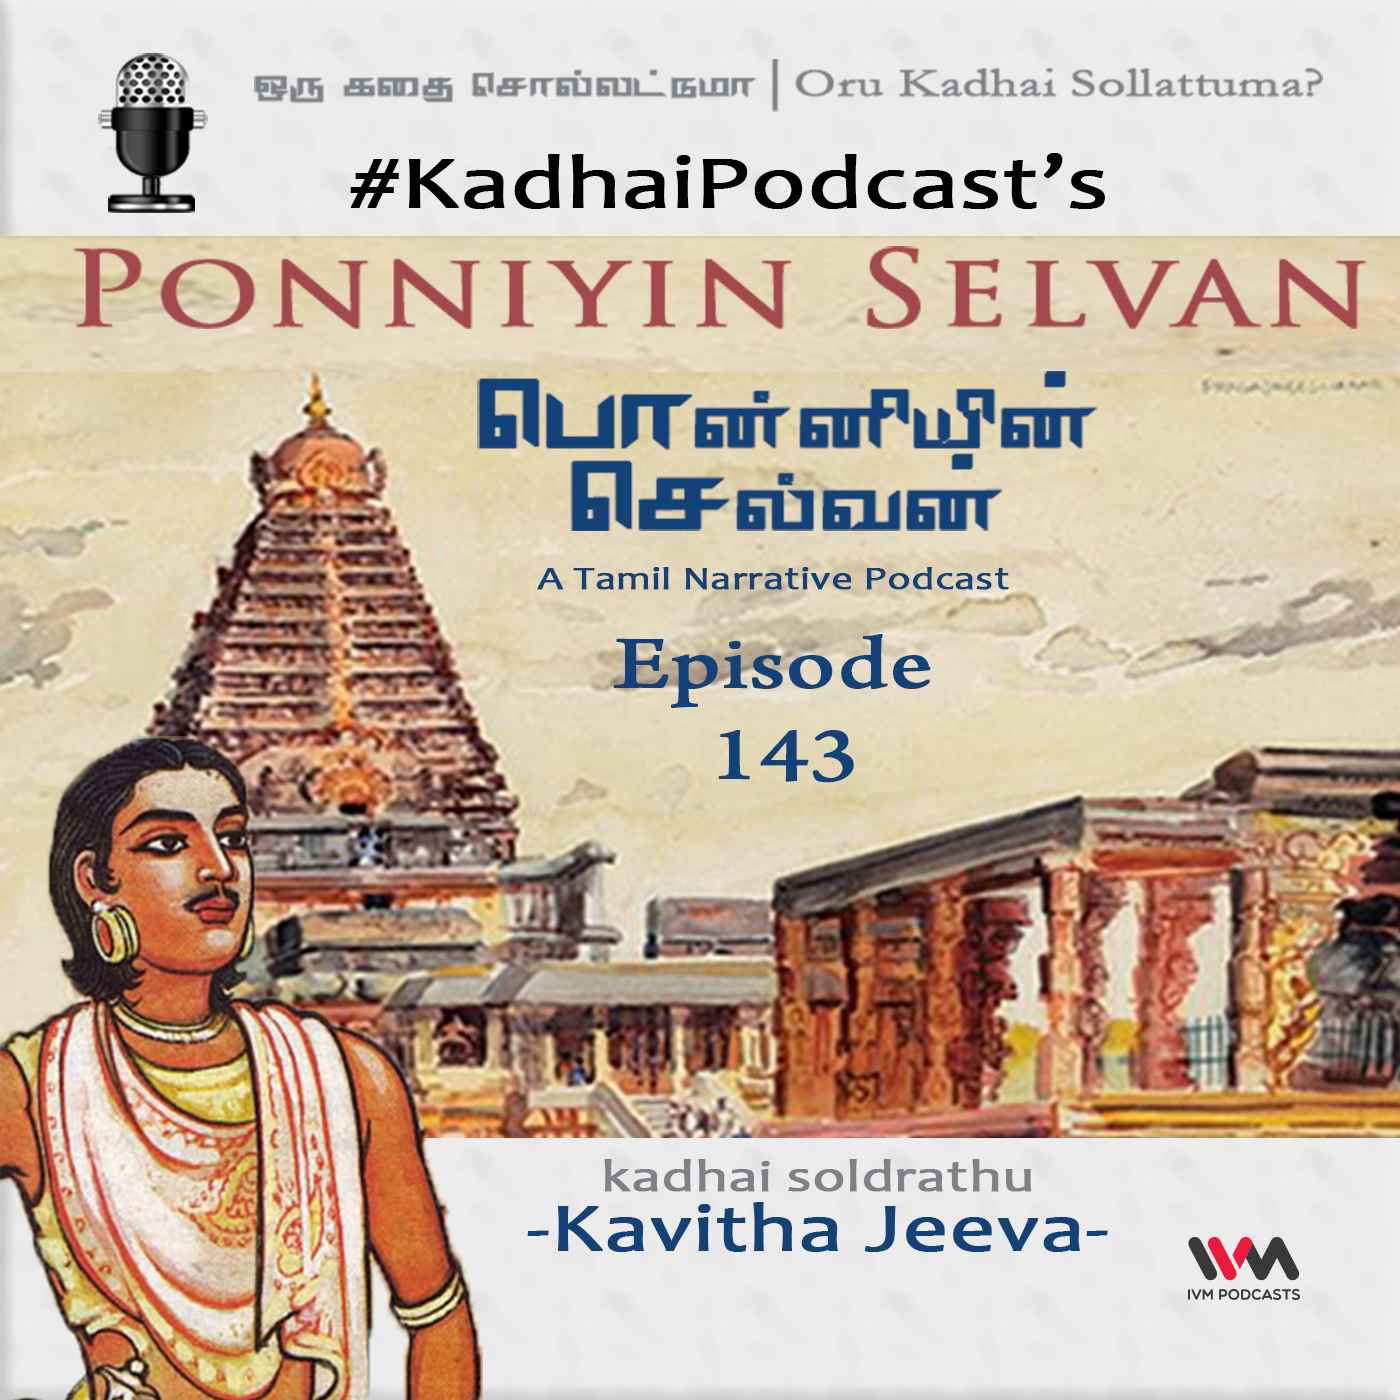 KadhaiPodcast's Ponniyin Selvan - Episode # 143